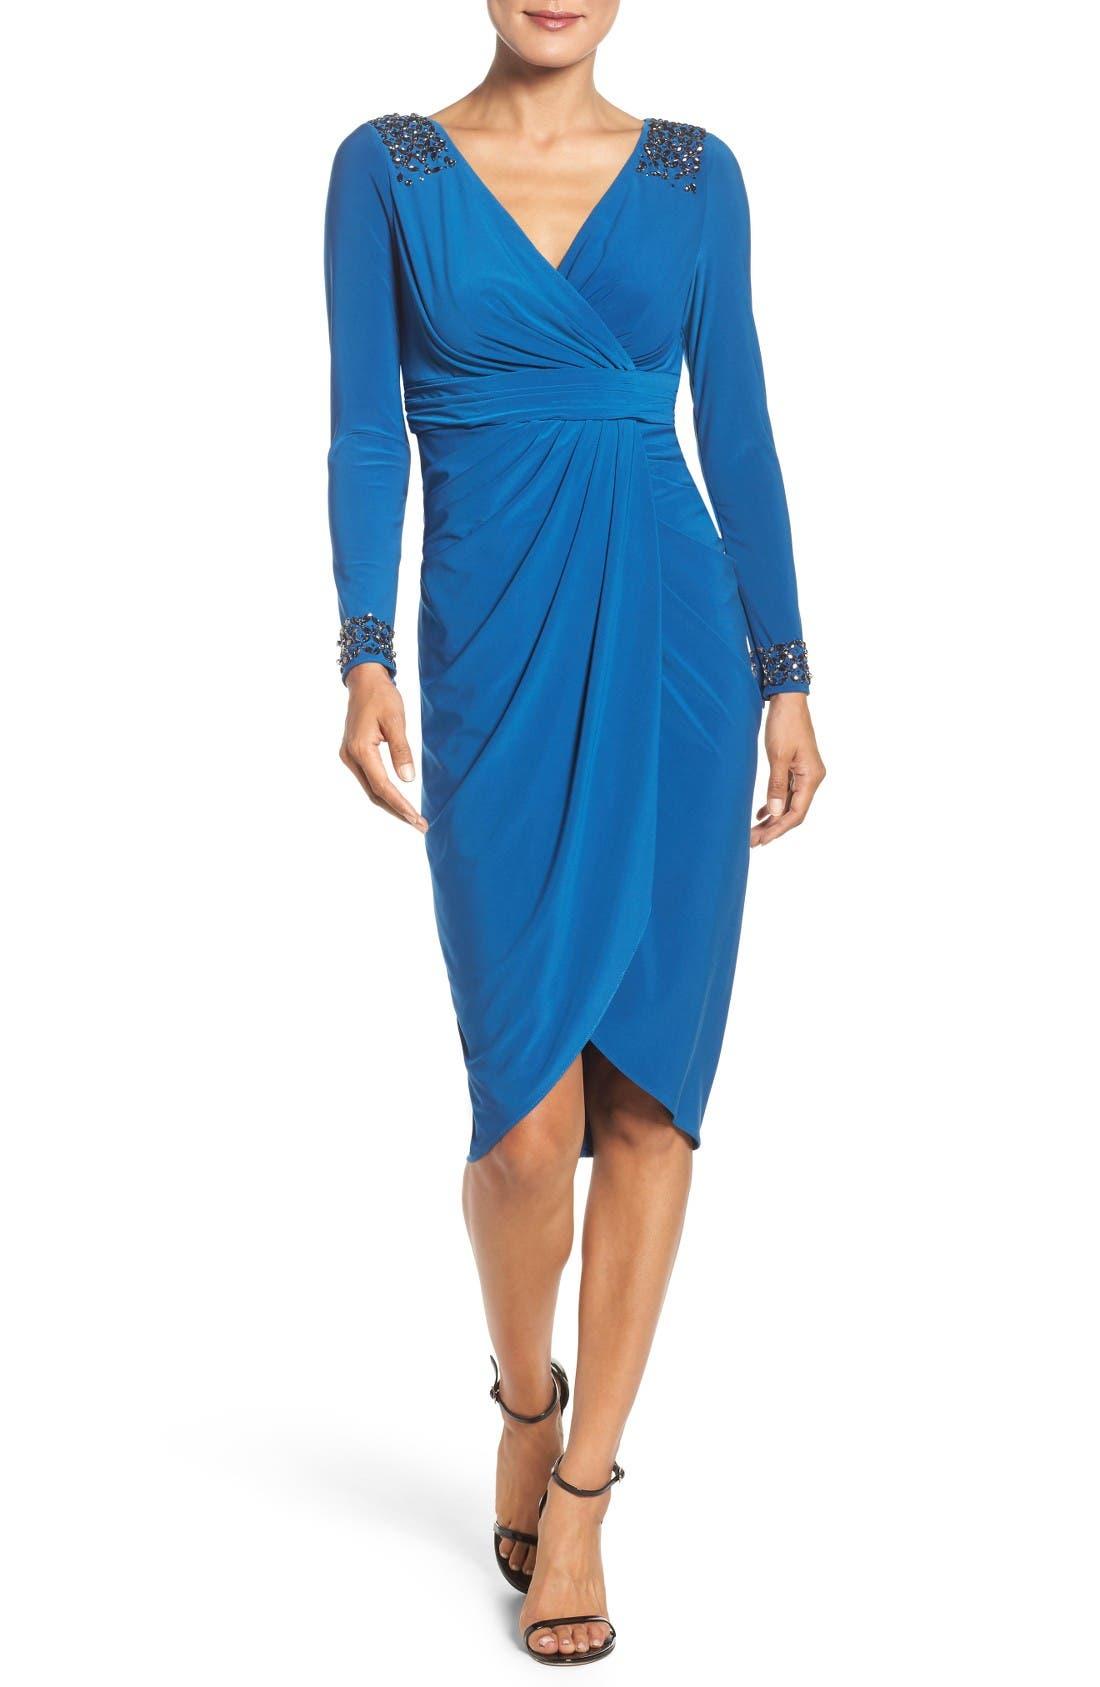 Alternate Image 1 Selected - Adrianna Papell Embellished Wrap Dress (Regular & Petite)